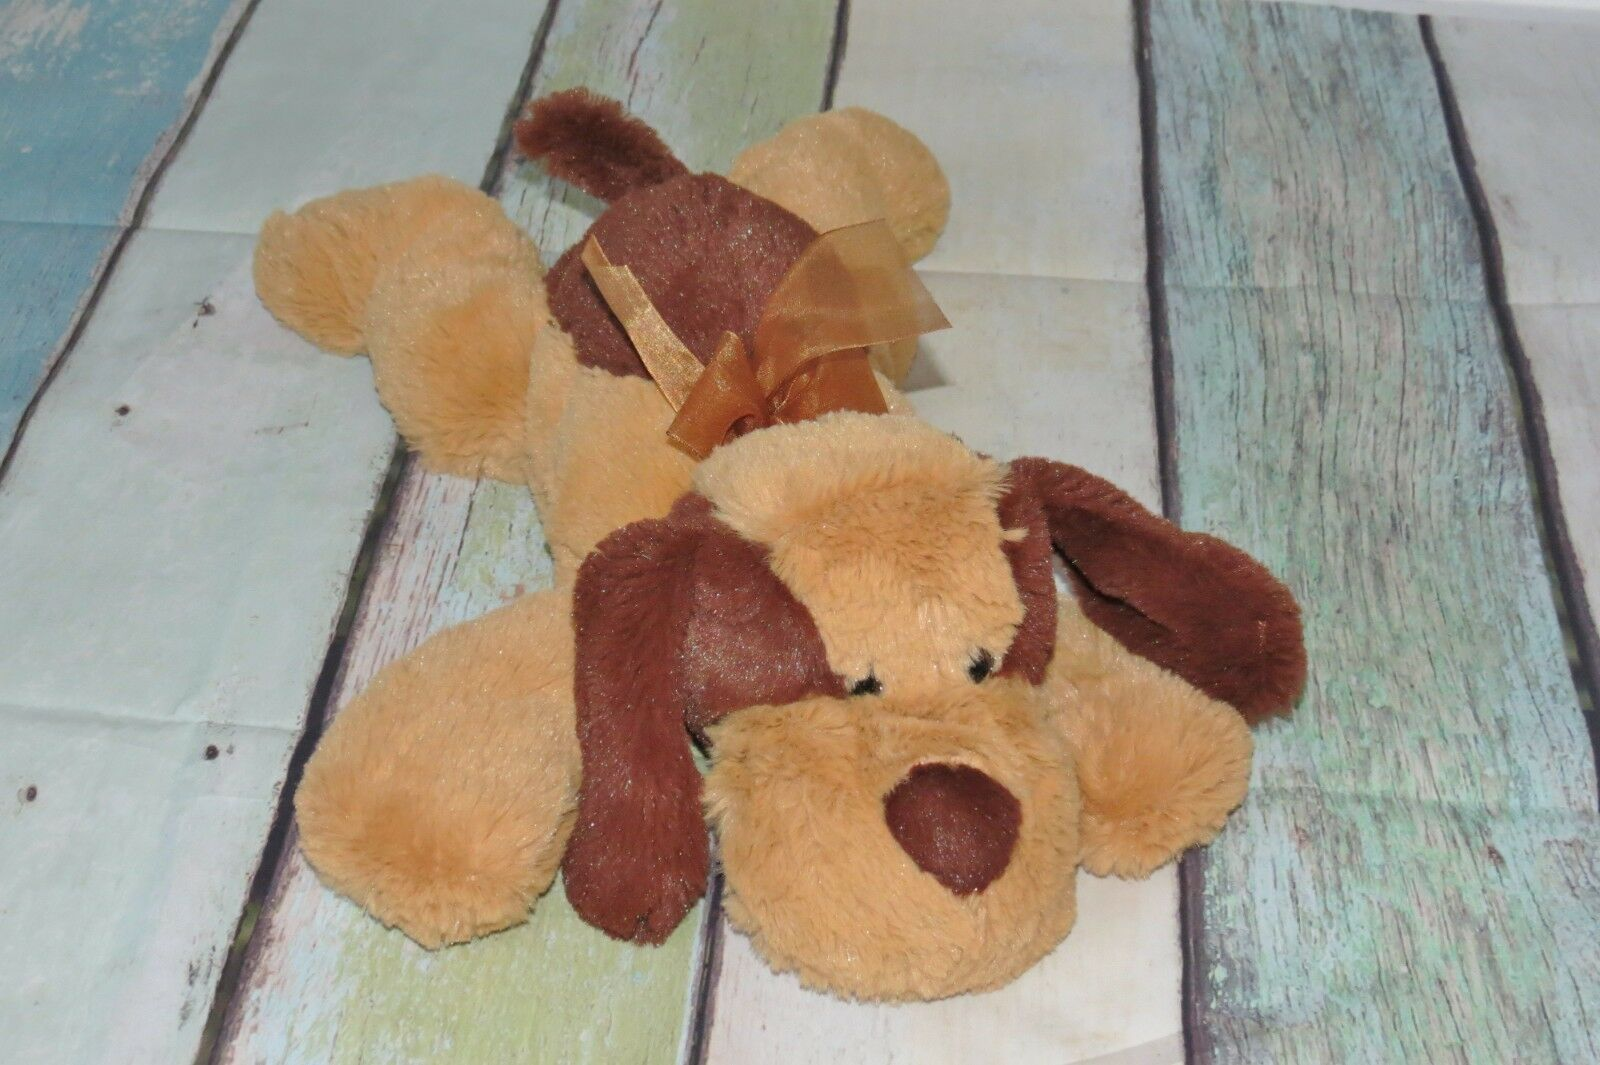 Circo Puppy Dog Braun Laying Super Soft Plush Stuffed Floppy Baby Toy 14